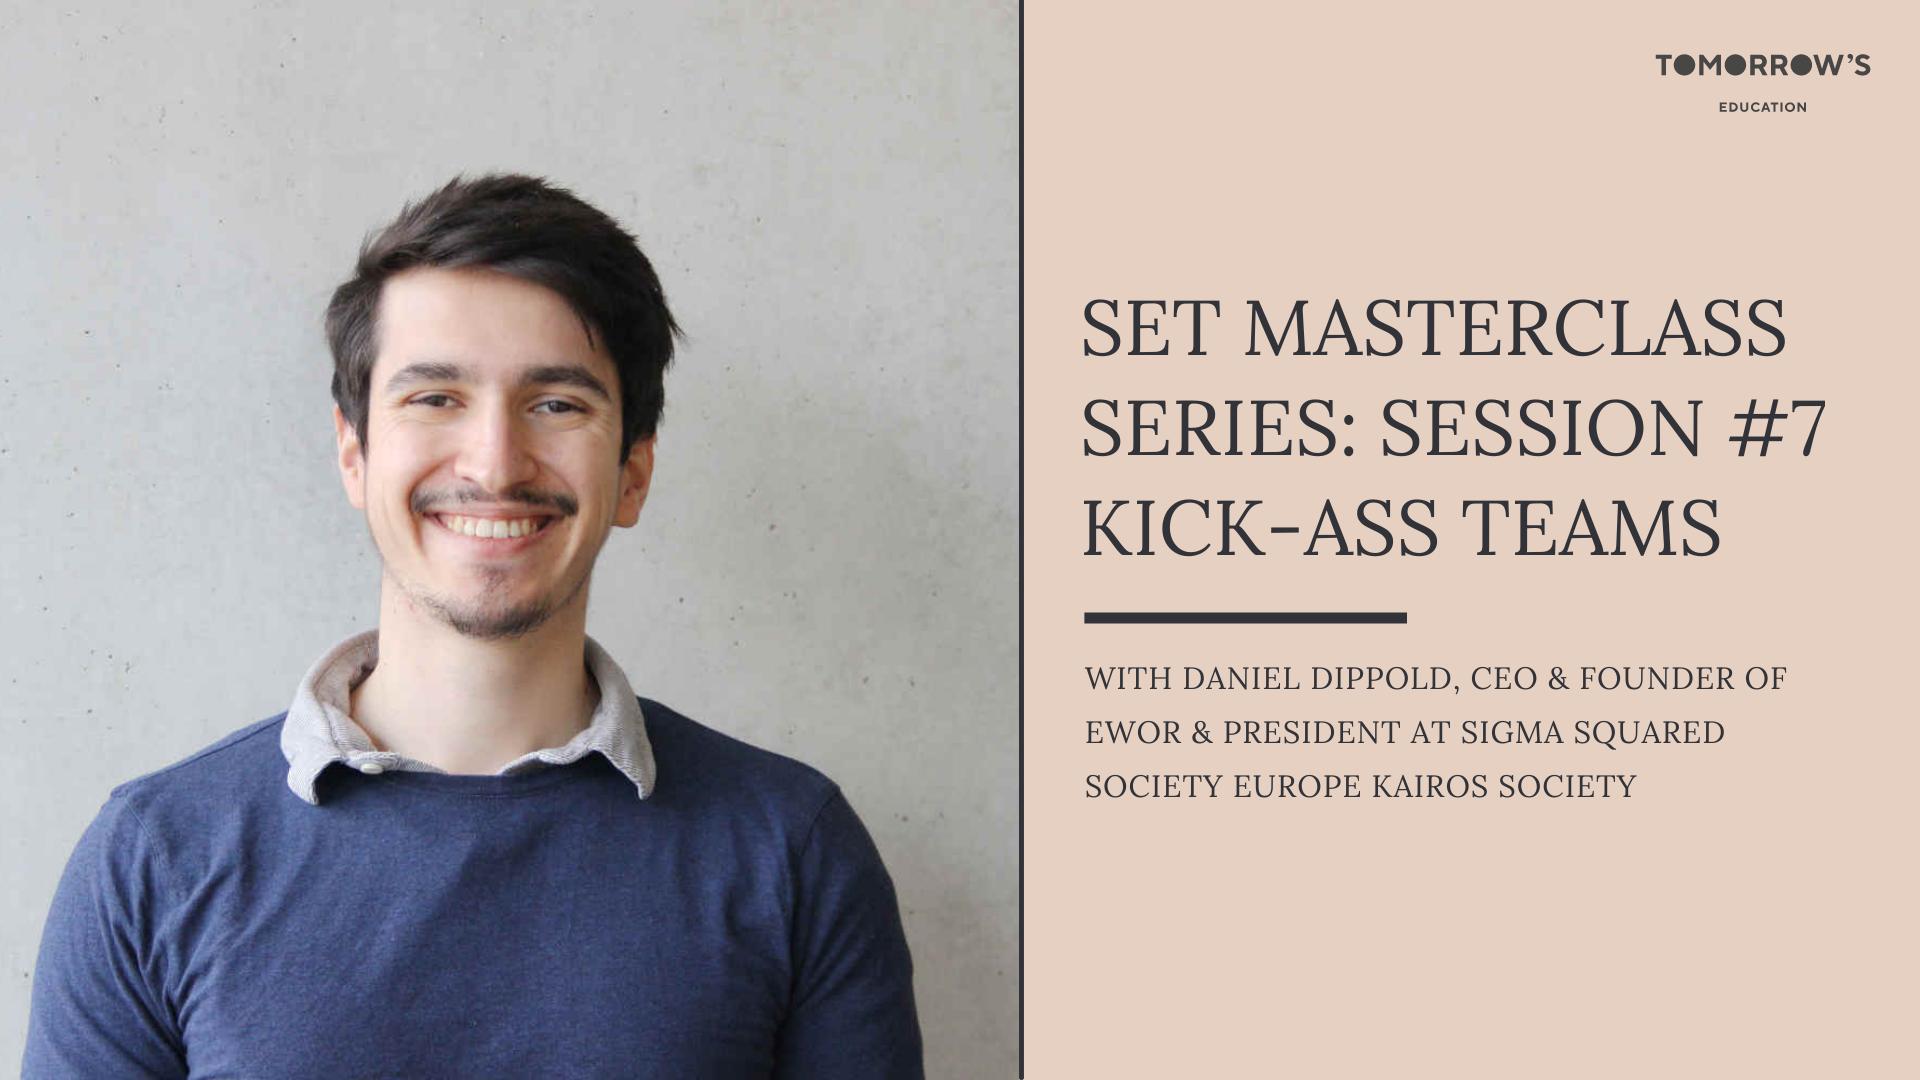 SET Masterclass Series: Session #7 Kick-ass teams with Daniel Dippold